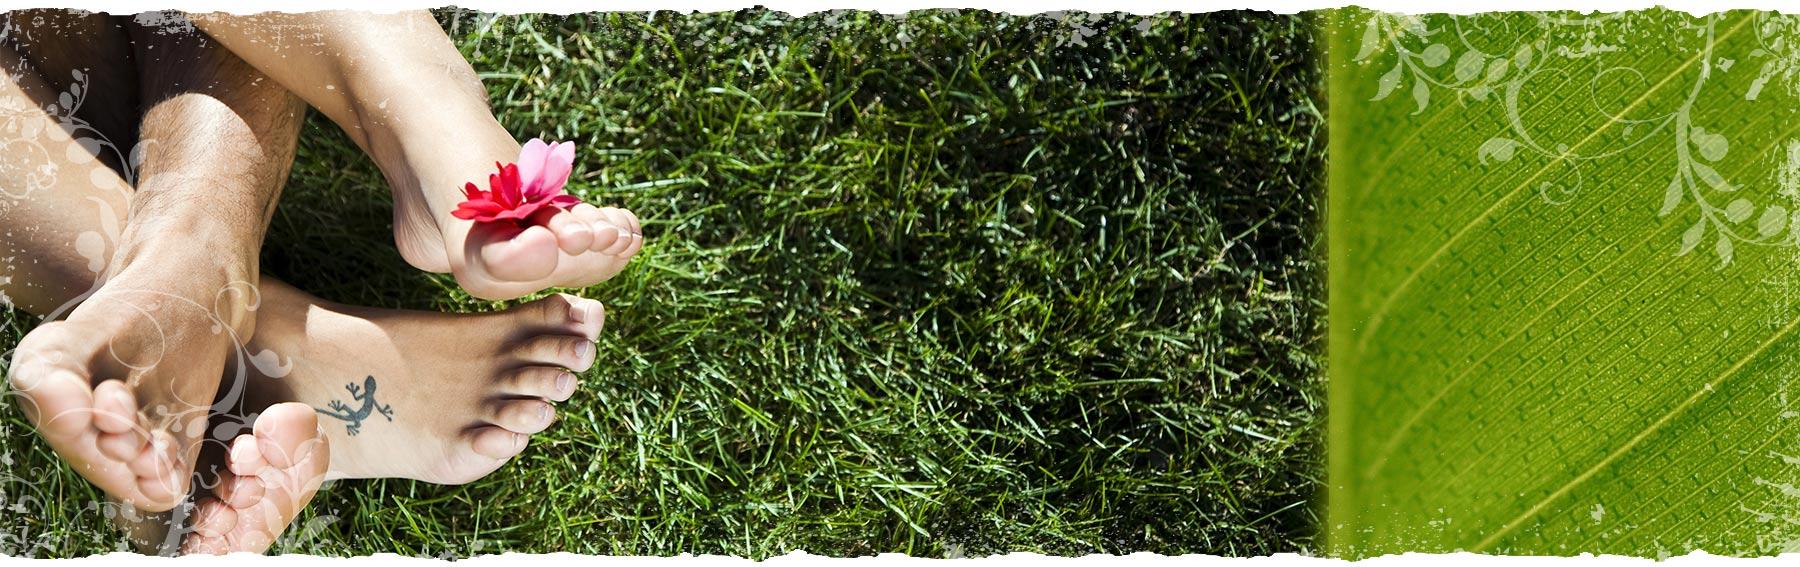 feetgrass